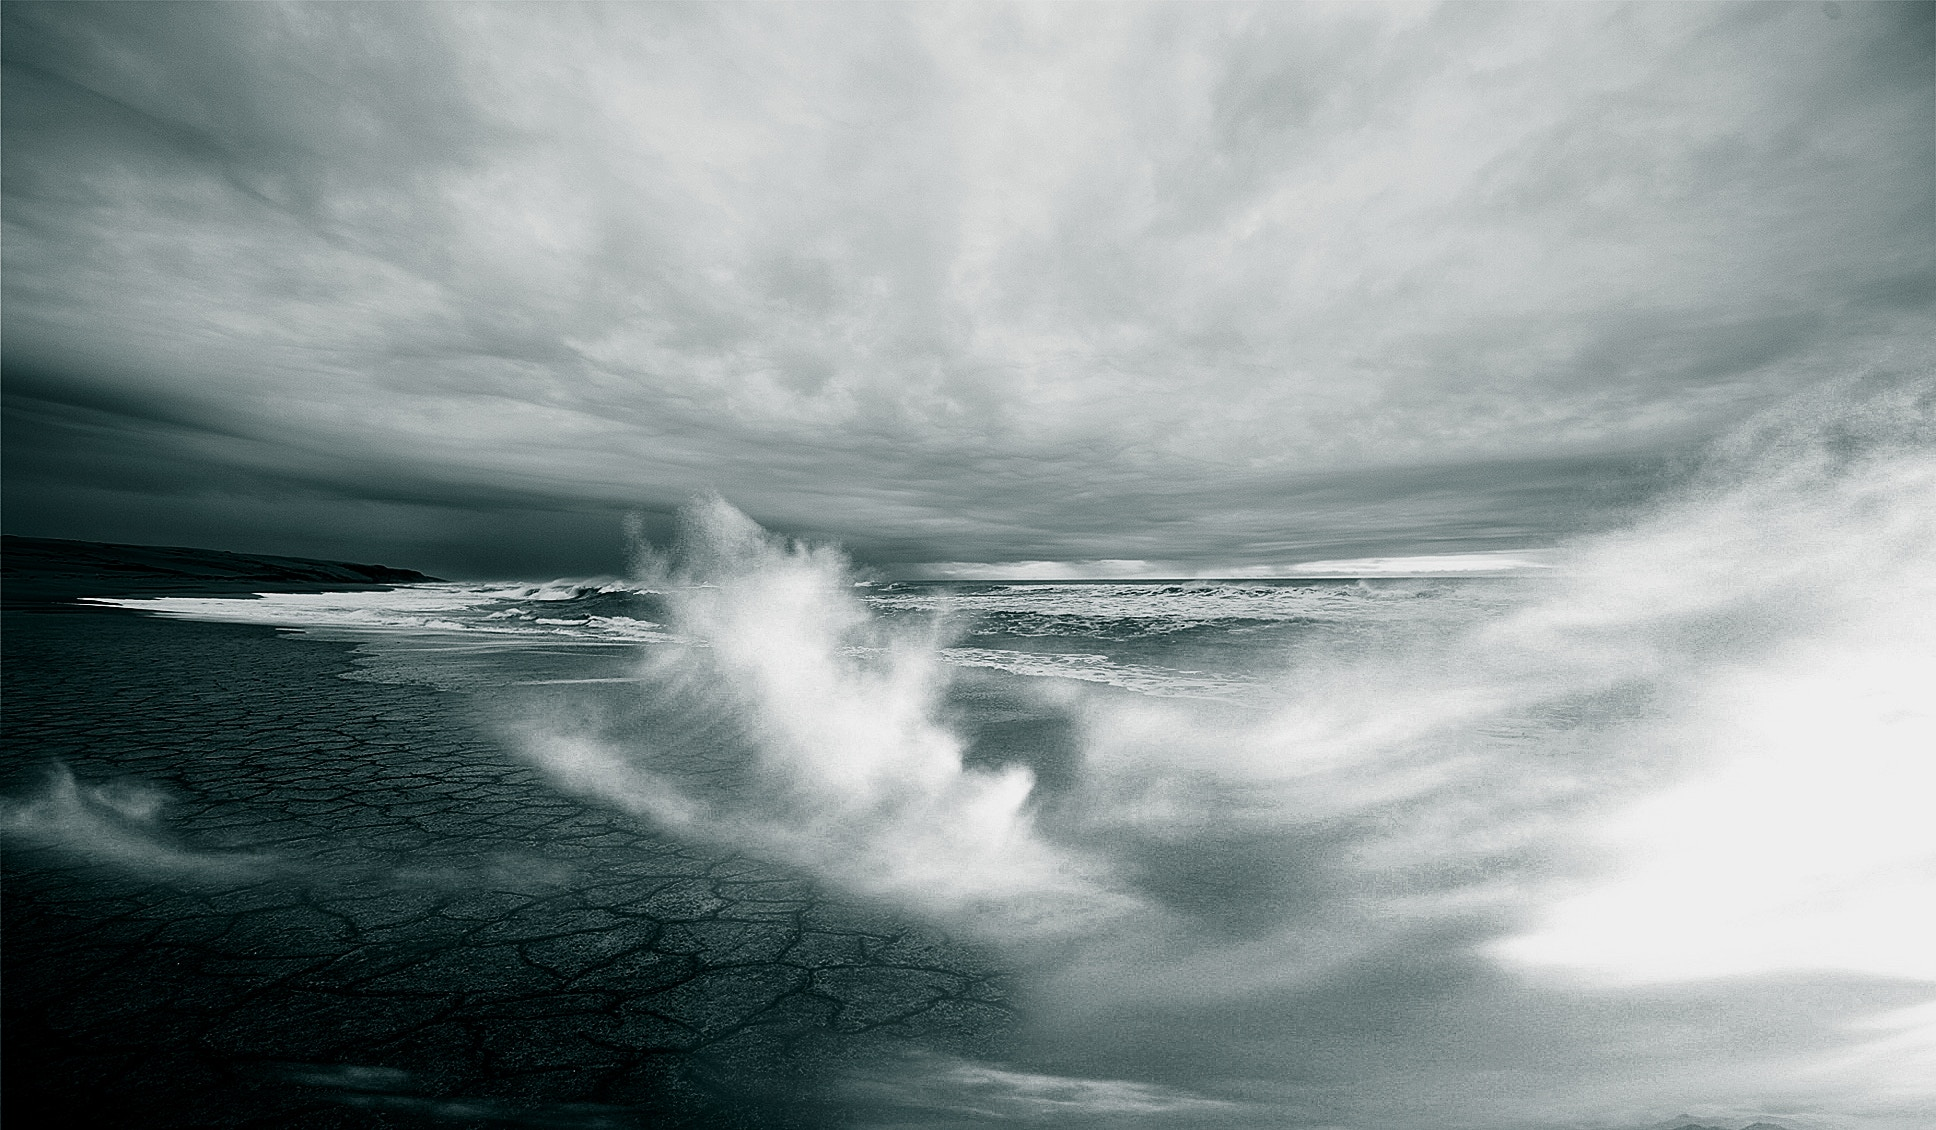 Photo by  Frantzou Fleurine on  Unsplash